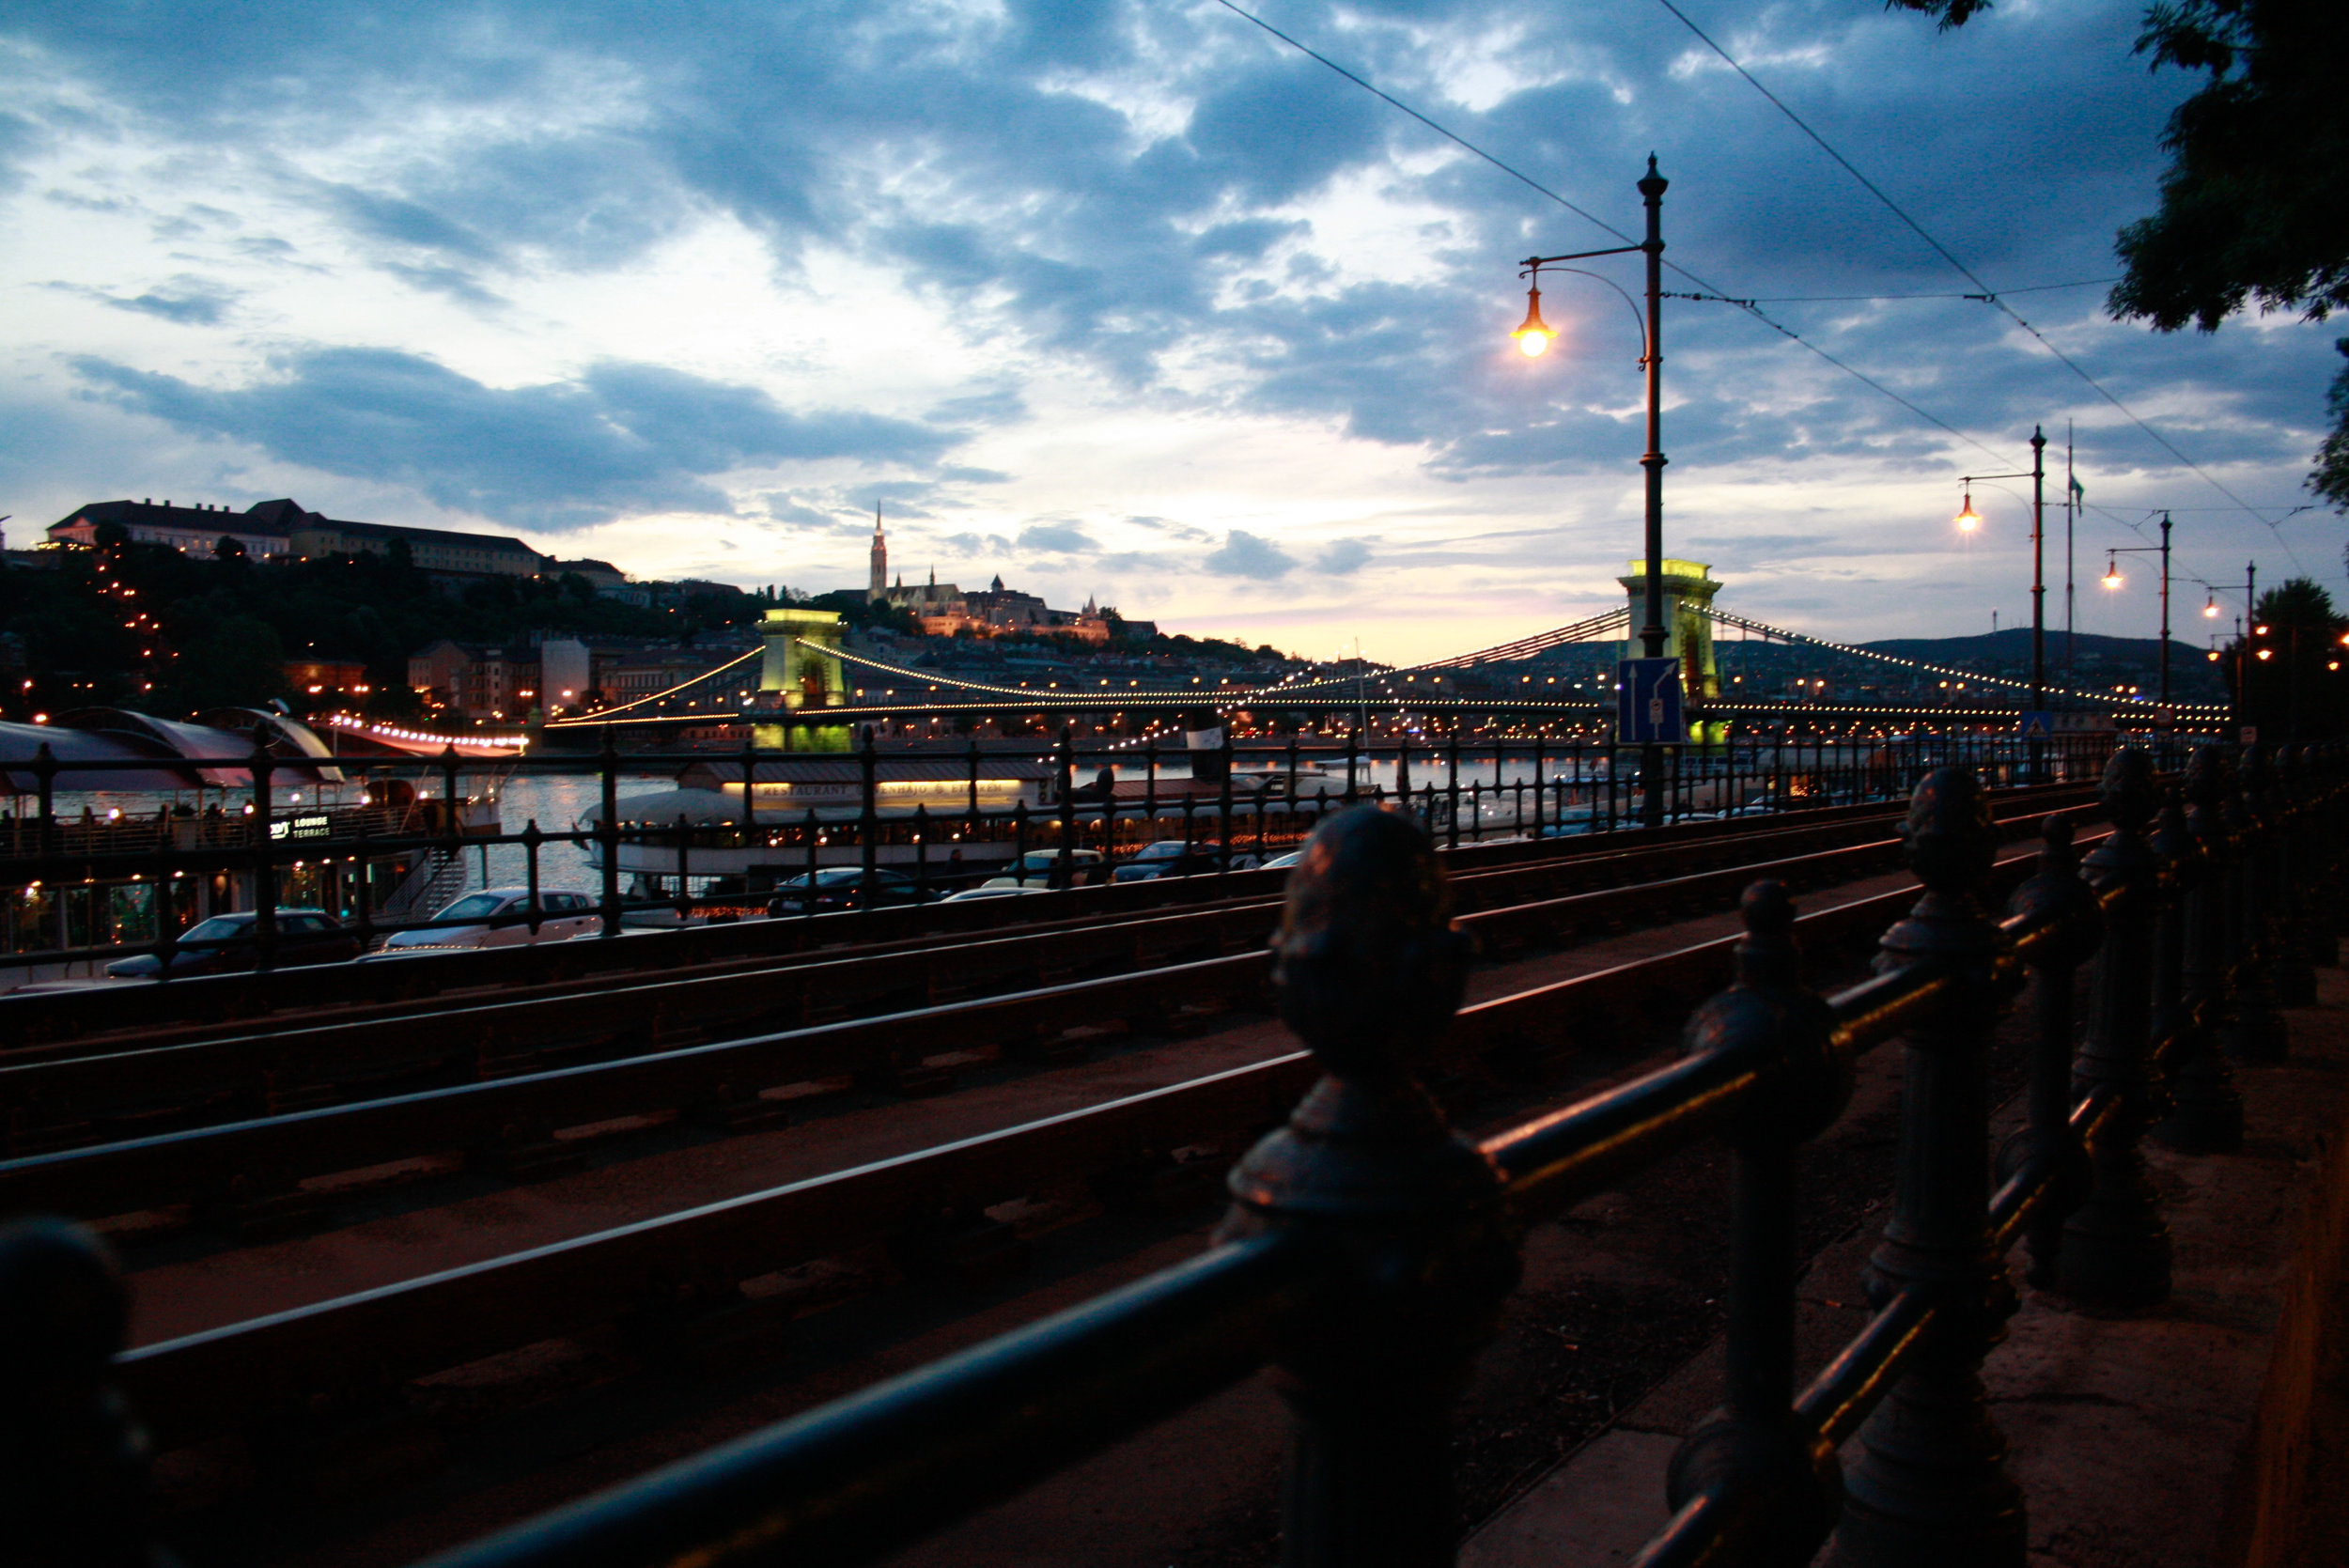 pest-boardwalk-budapest